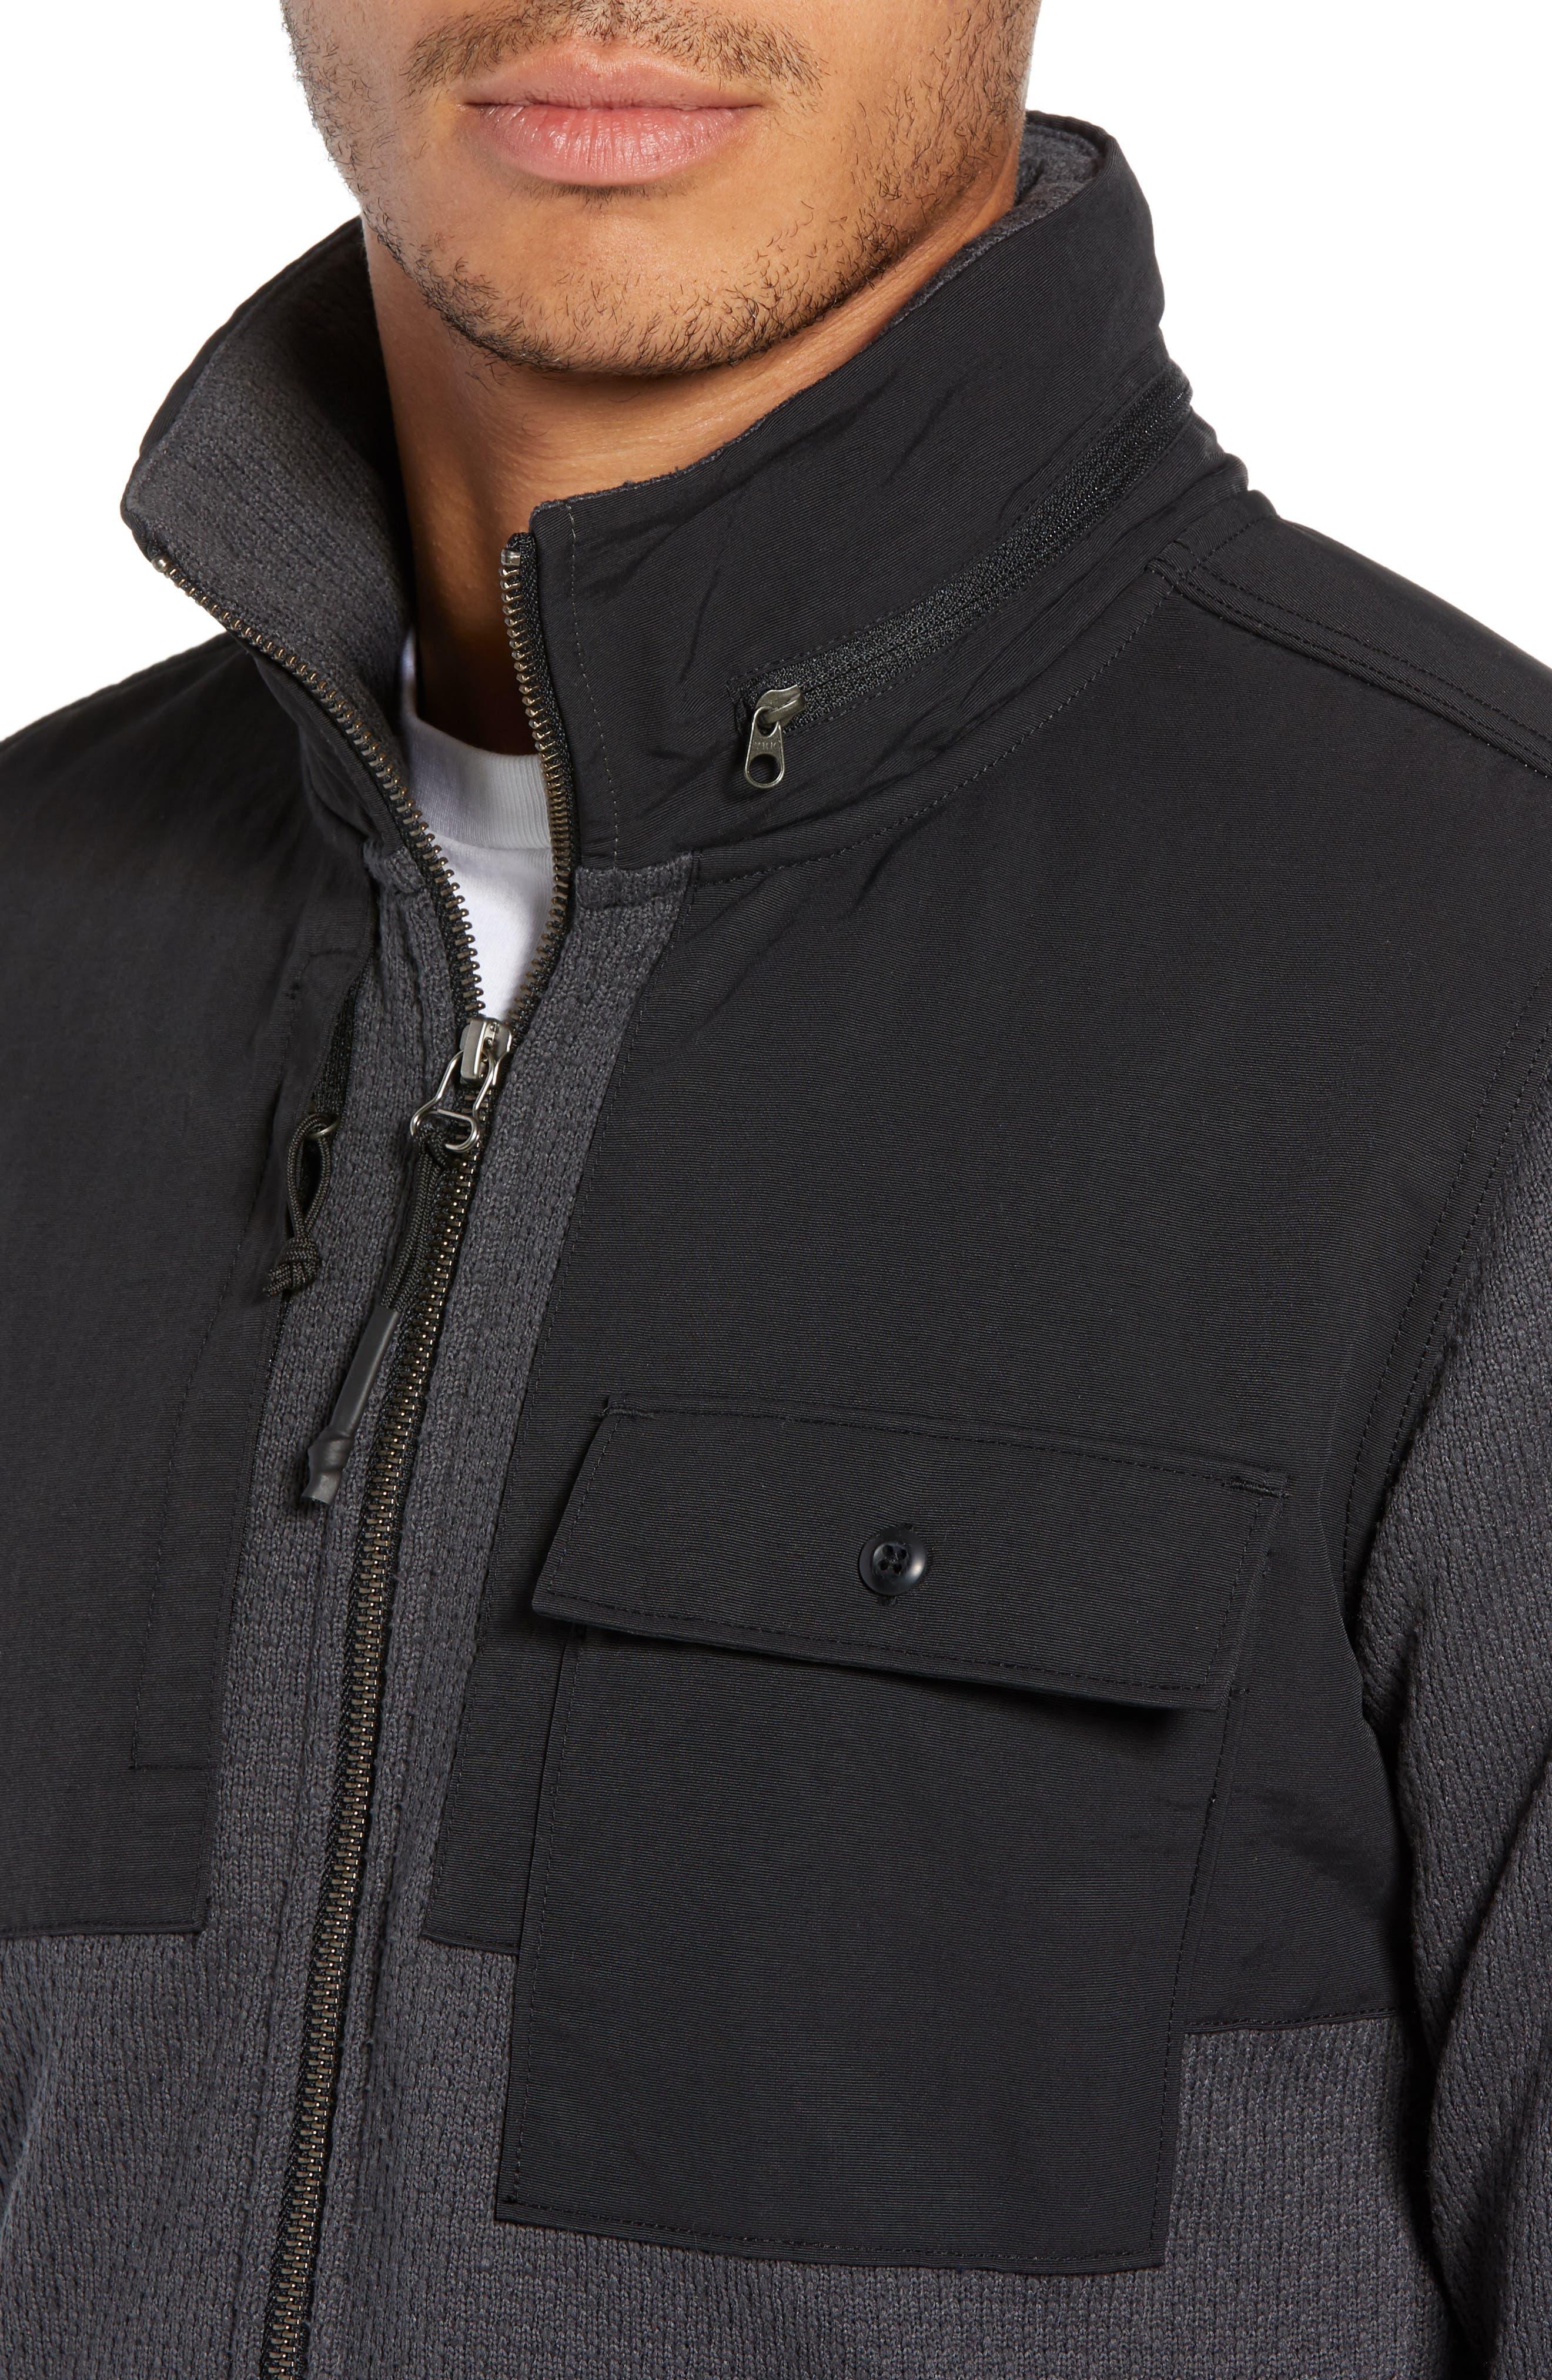 Be-Layed Back Jacket,                             Alternate thumbnail 4, color,                             ASPHALT GREY